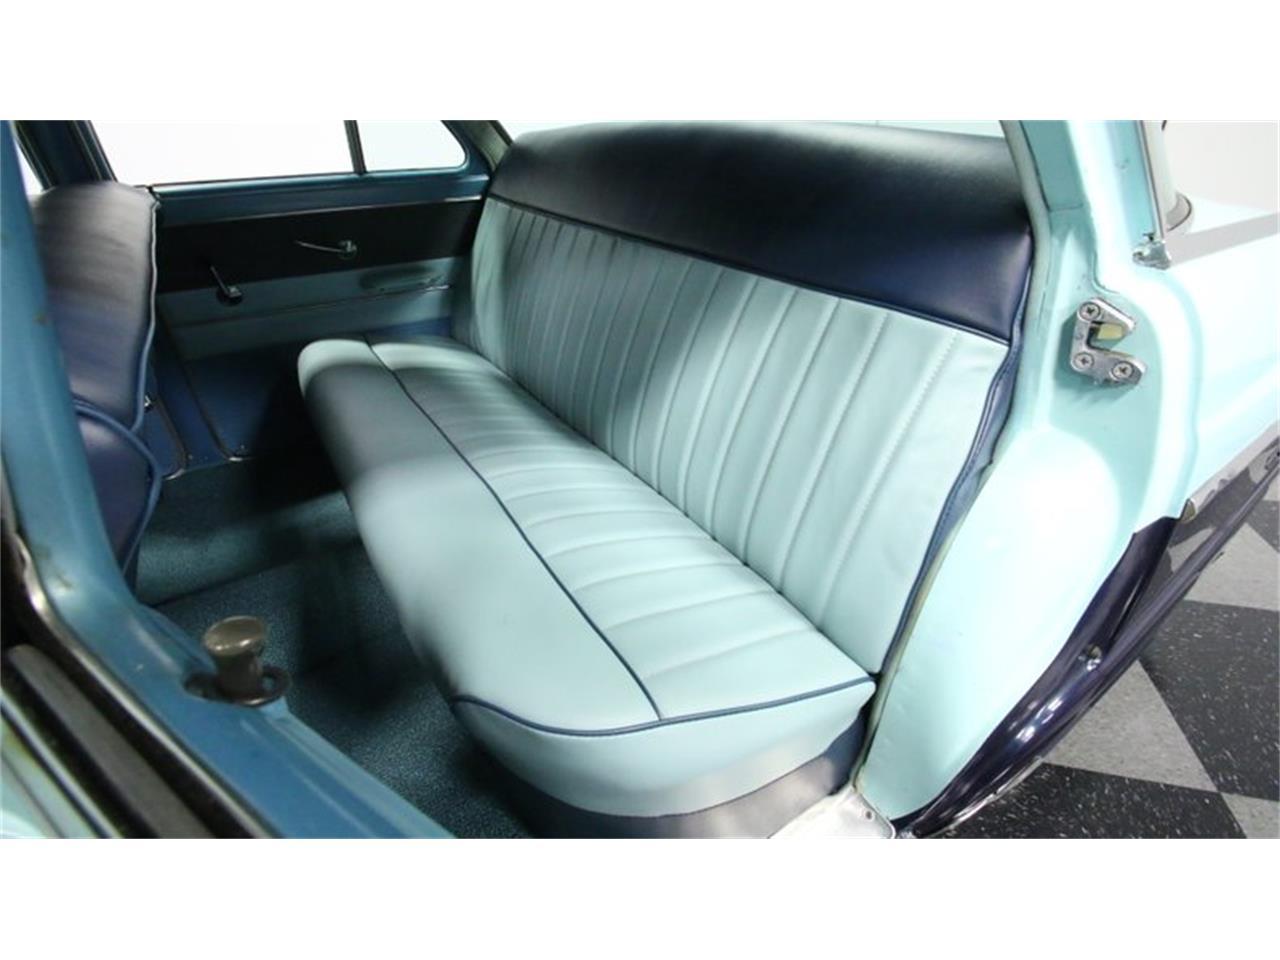 1955 Ford Fairlane (CC-1192478) for sale in Lithia Springs, Georgia